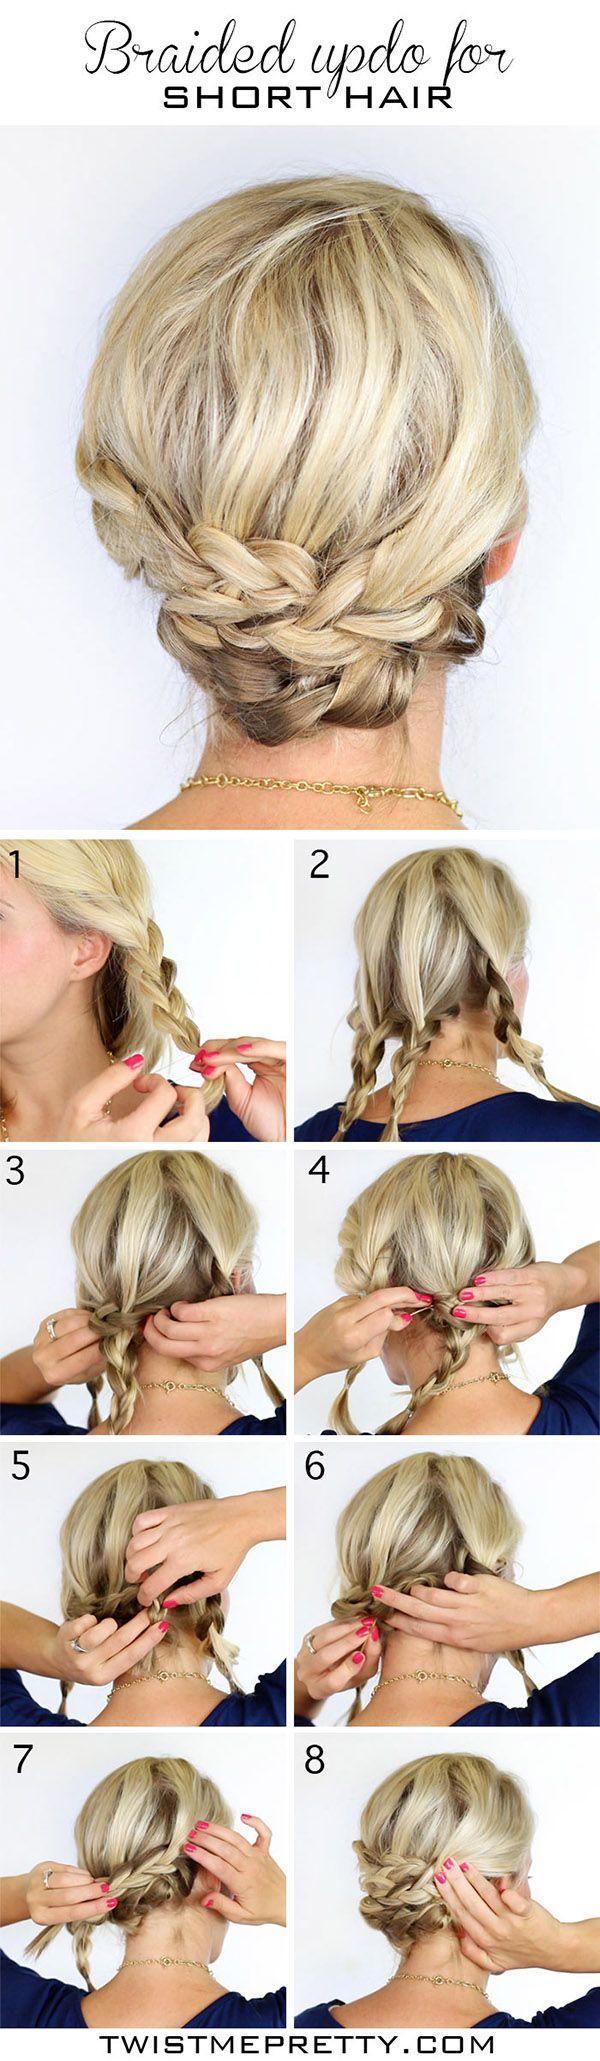 Phenomenal 1000 Ideas About Medium Length Updo On Pinterest Fine Hair Updo Hairstyle Inspiration Daily Dogsangcom